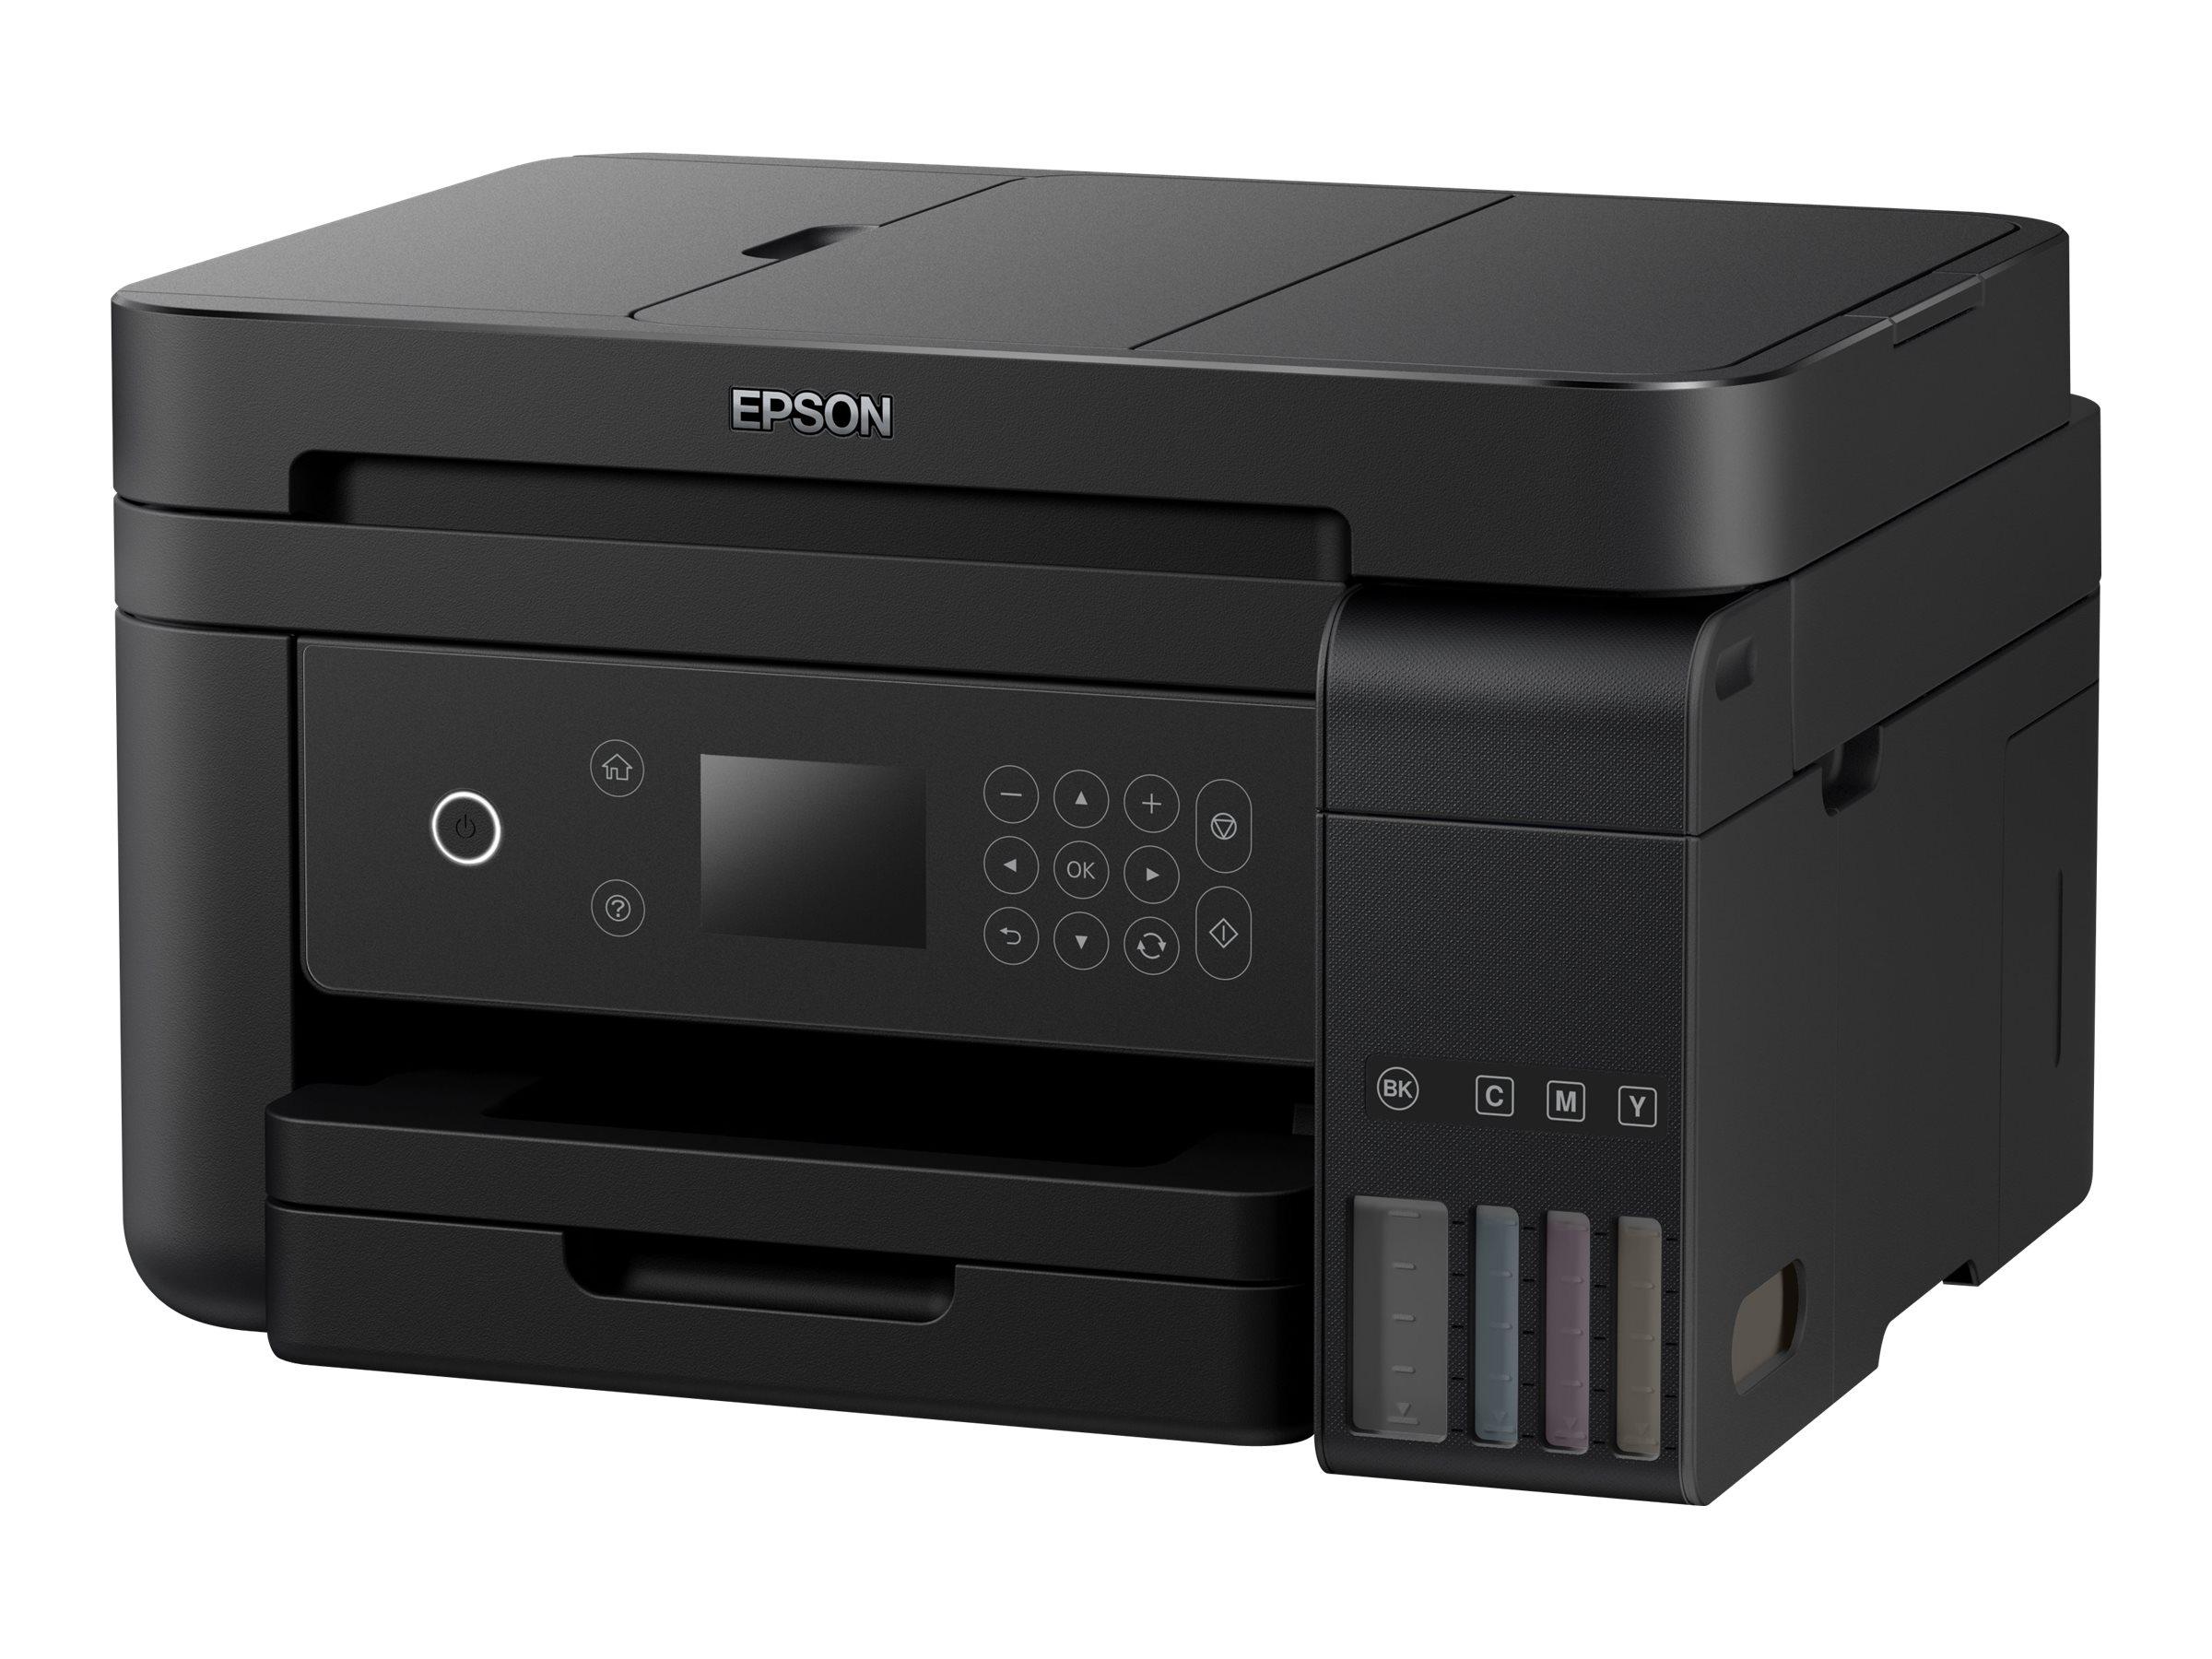 Epson EcoTank ET-3750 - Multifunktionsdrucker - Farbe - Tintenstrahl - A4 (210 x 297 mm) (Original) - A4/Legal (Medien)